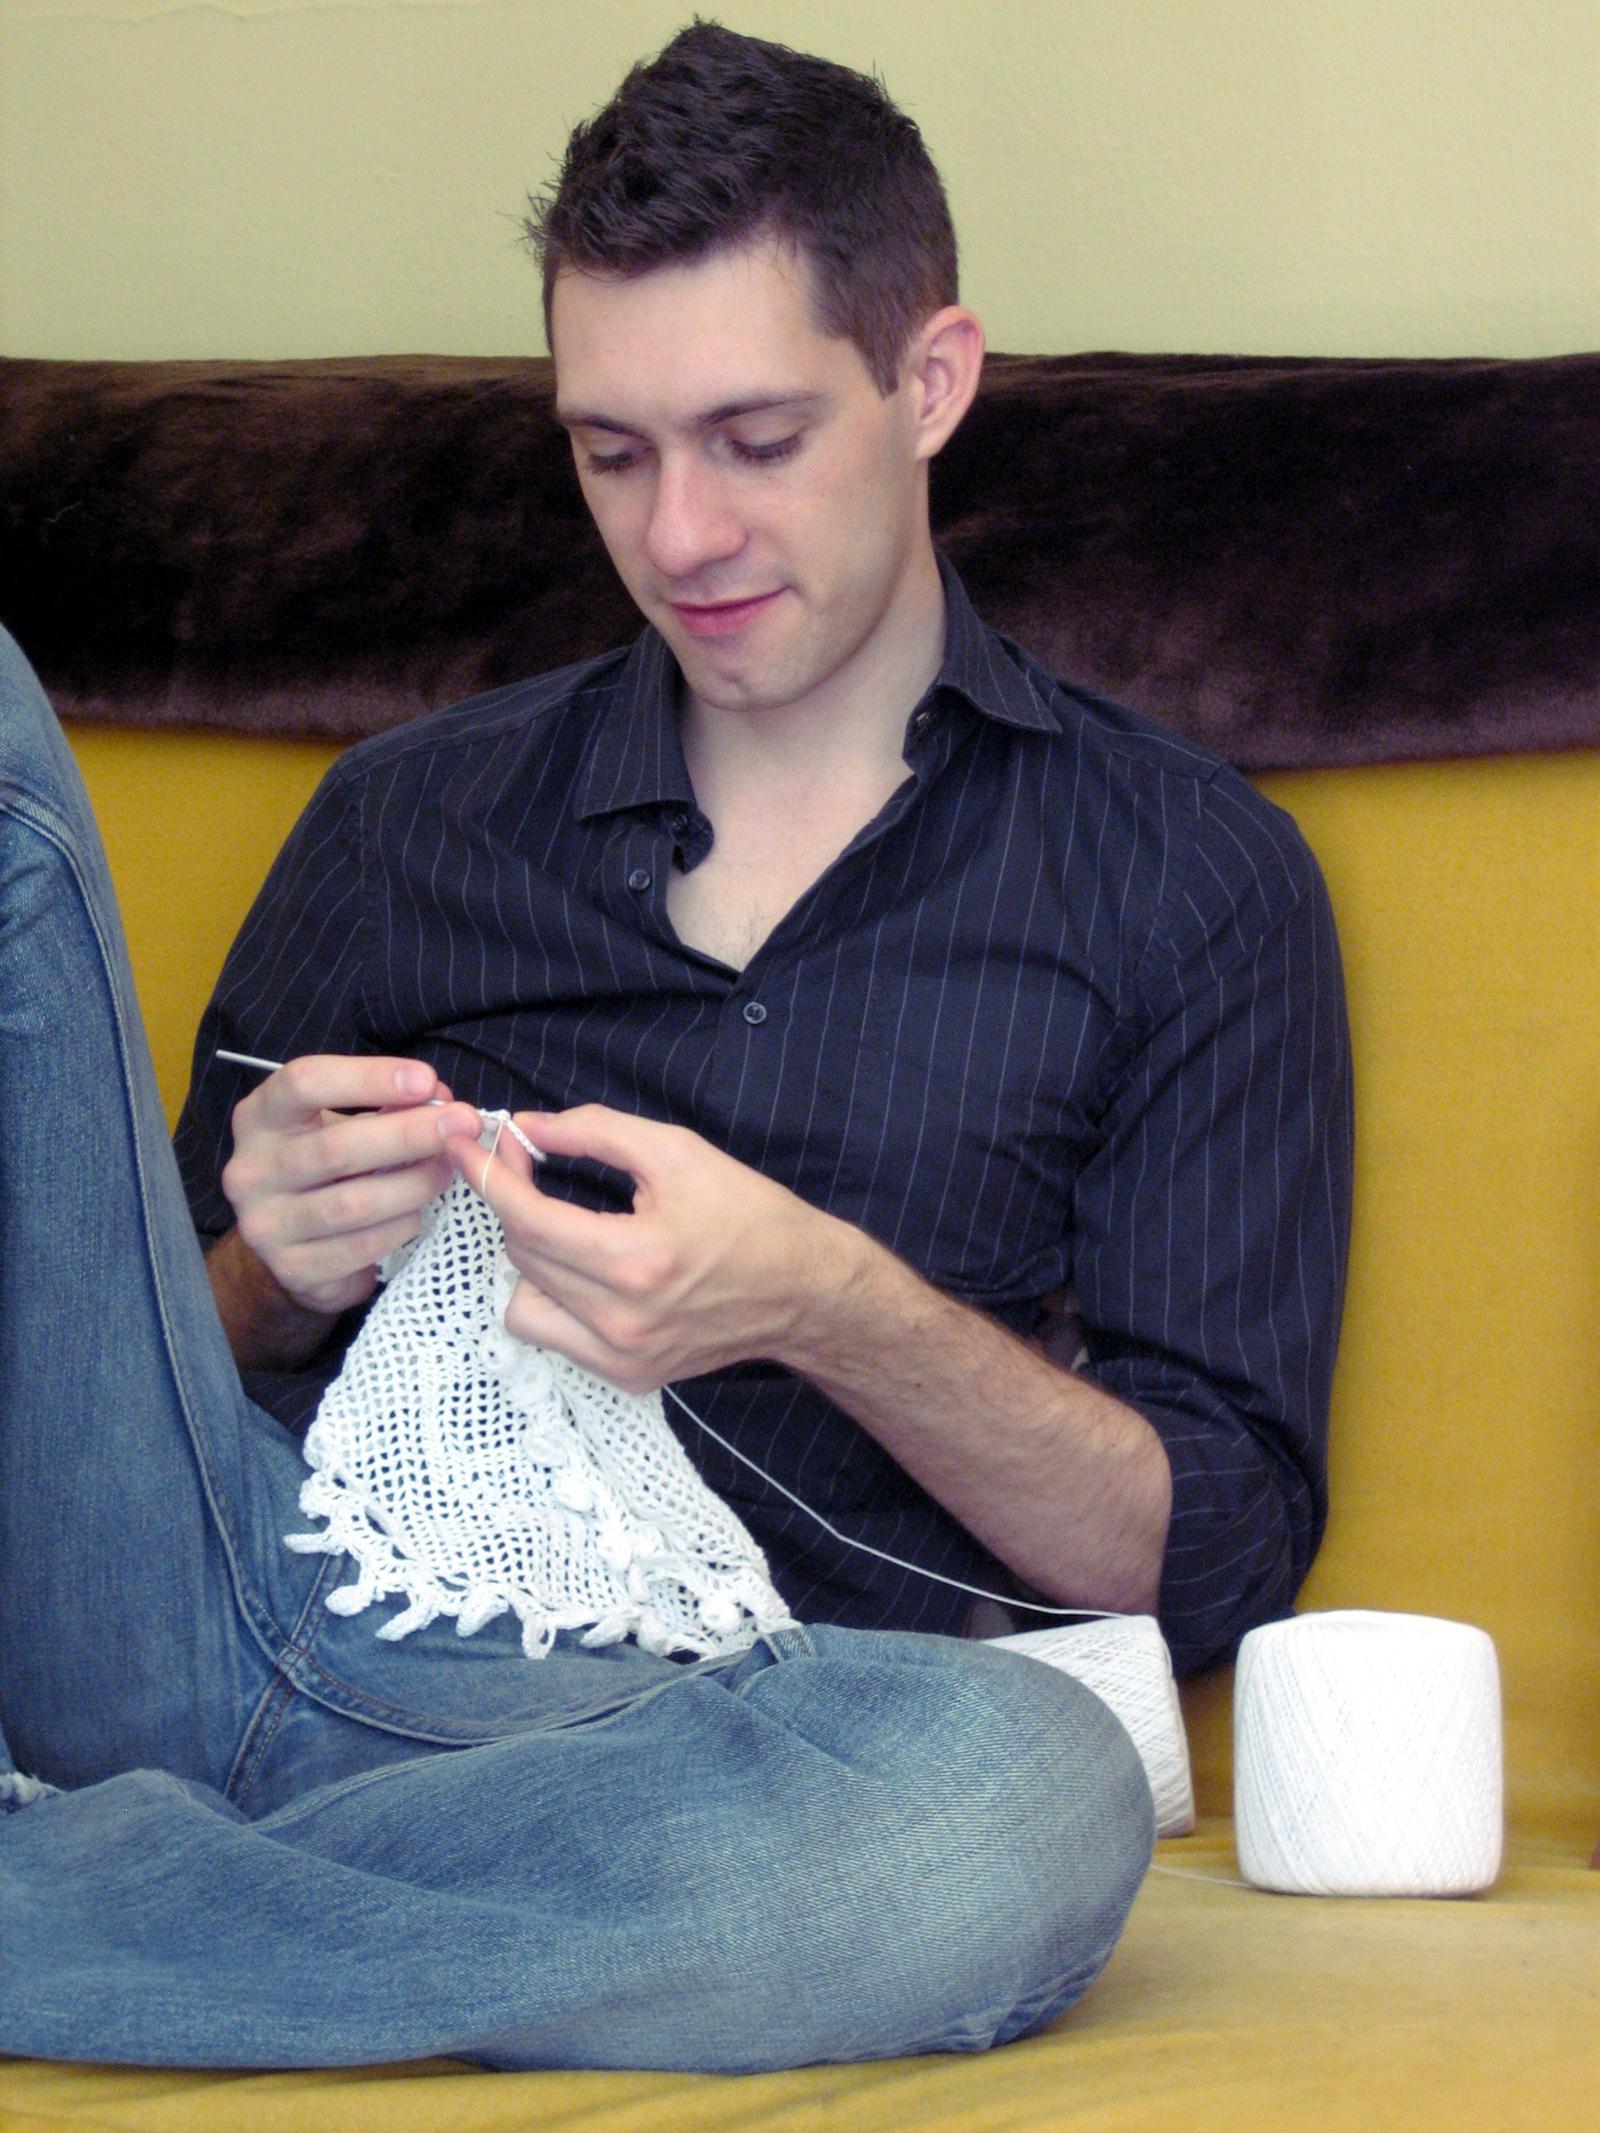 nathan vincent portrait sewing